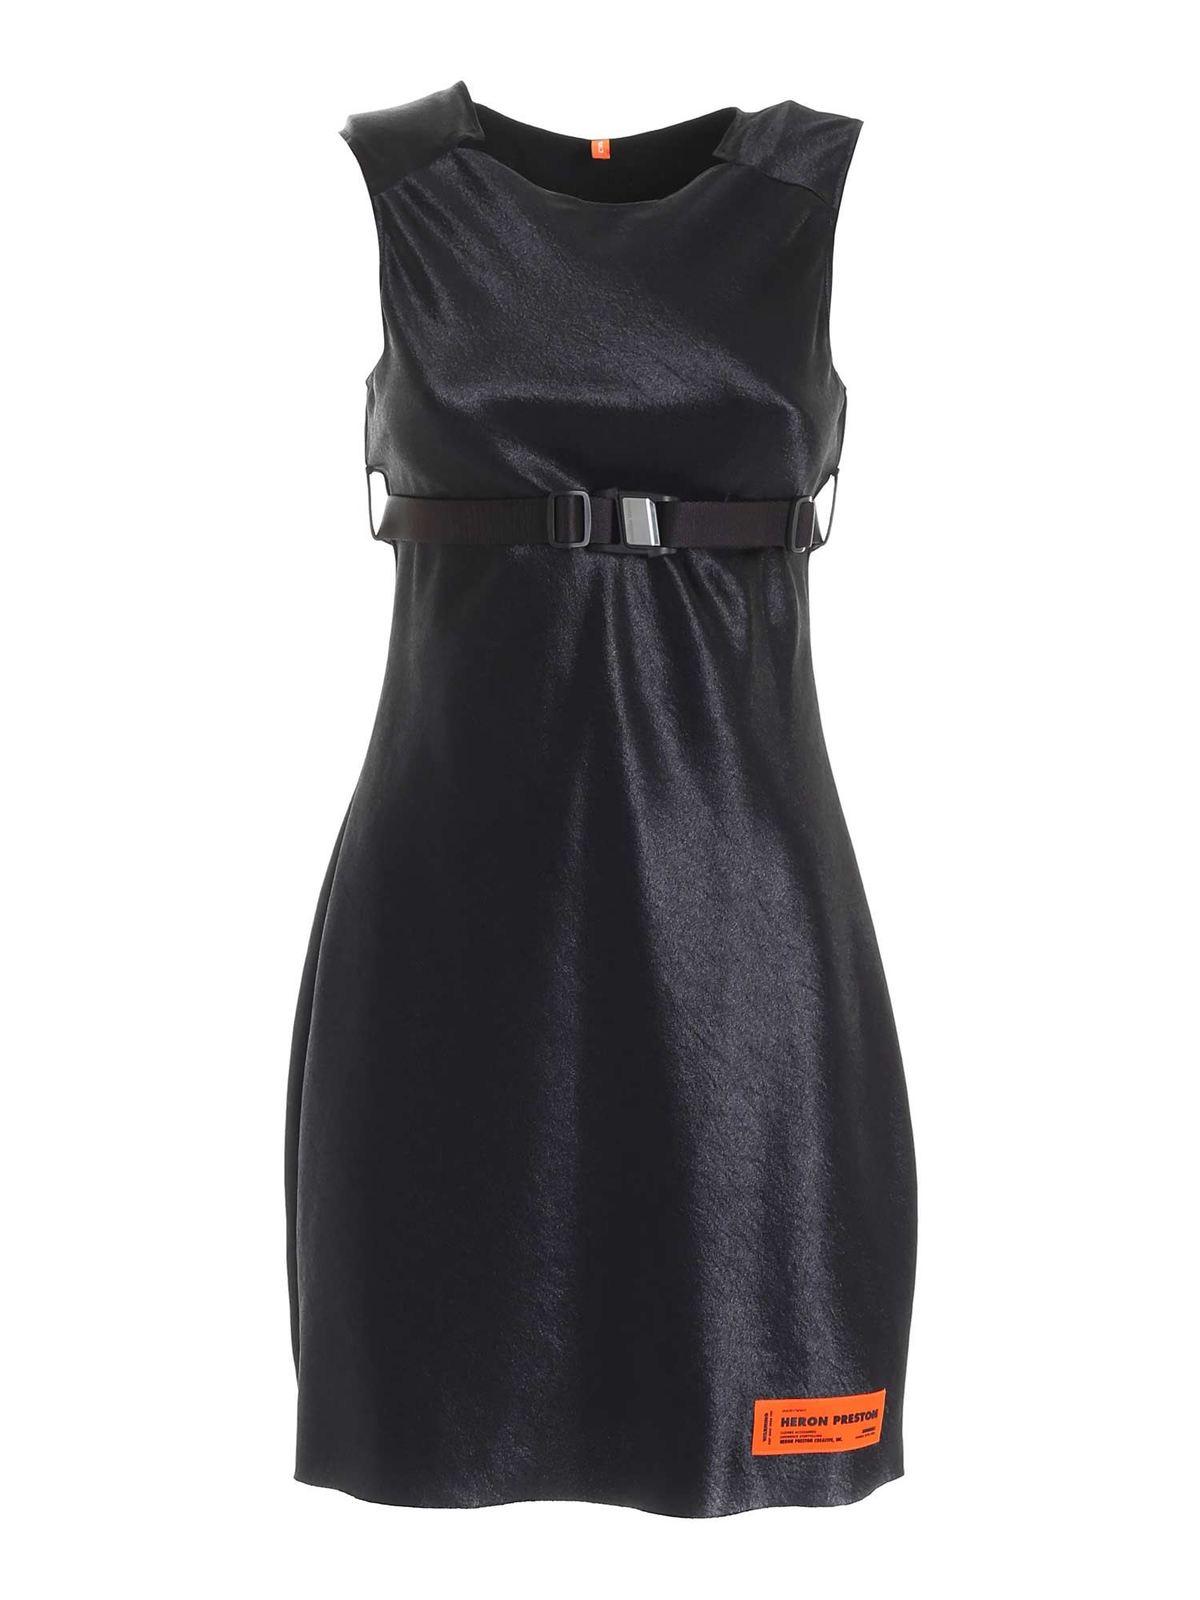 Heron Preston LOGO PATCH SLEEVELESS DRESS IN BLACK